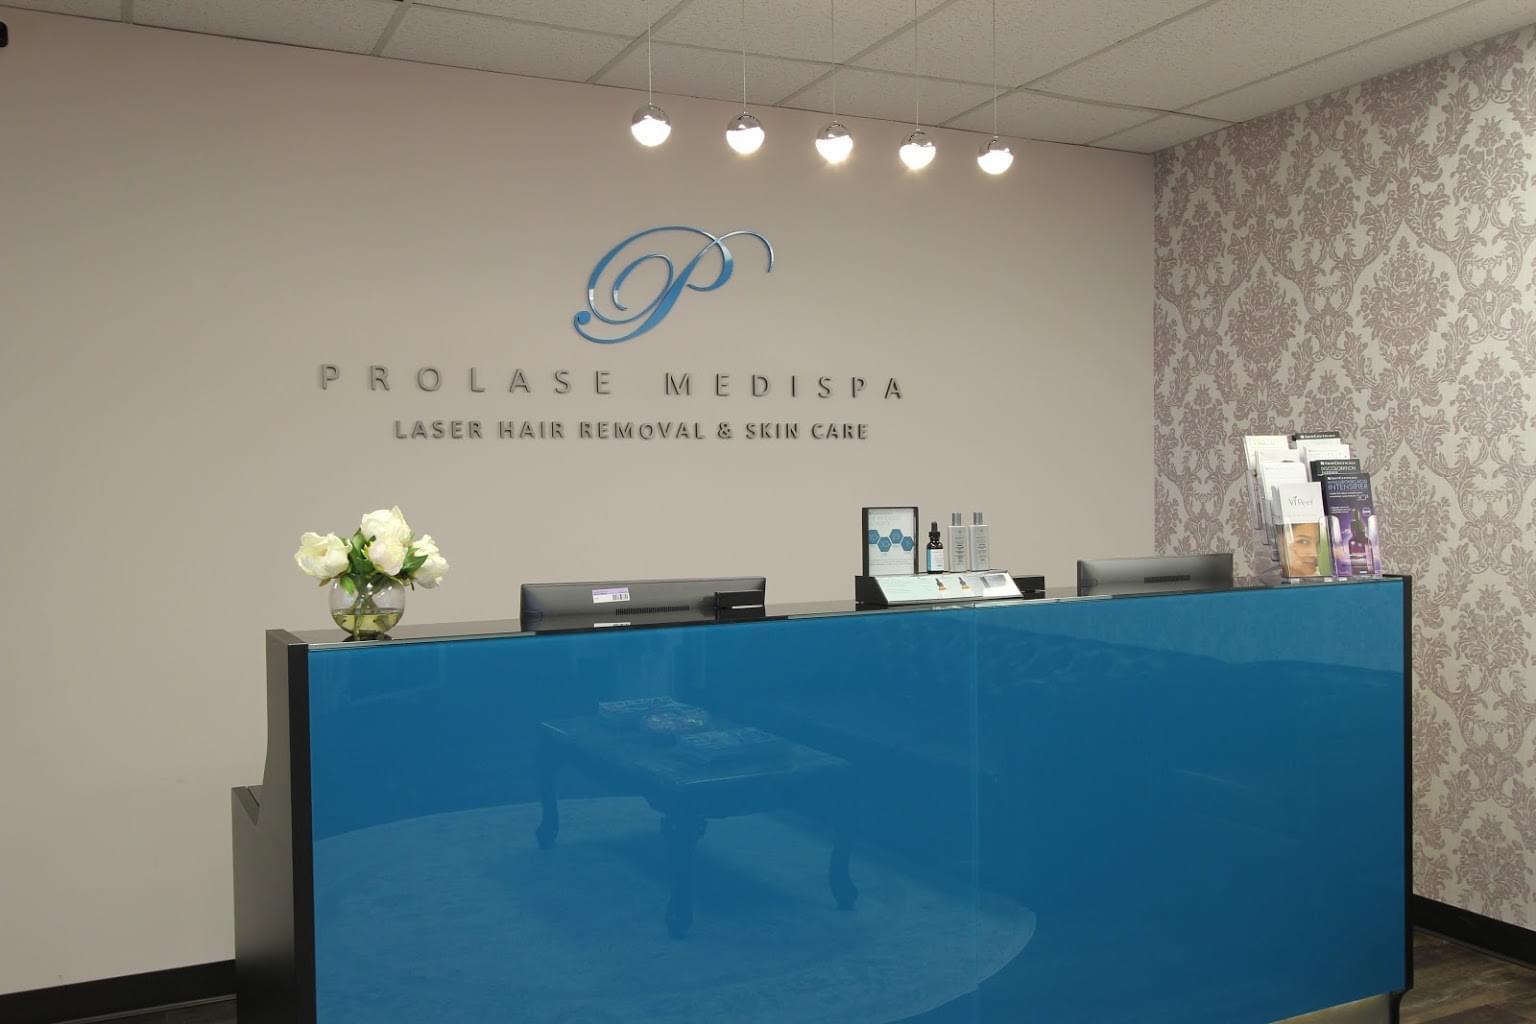 Prolase Medispa medical spa in Fairfax, VA